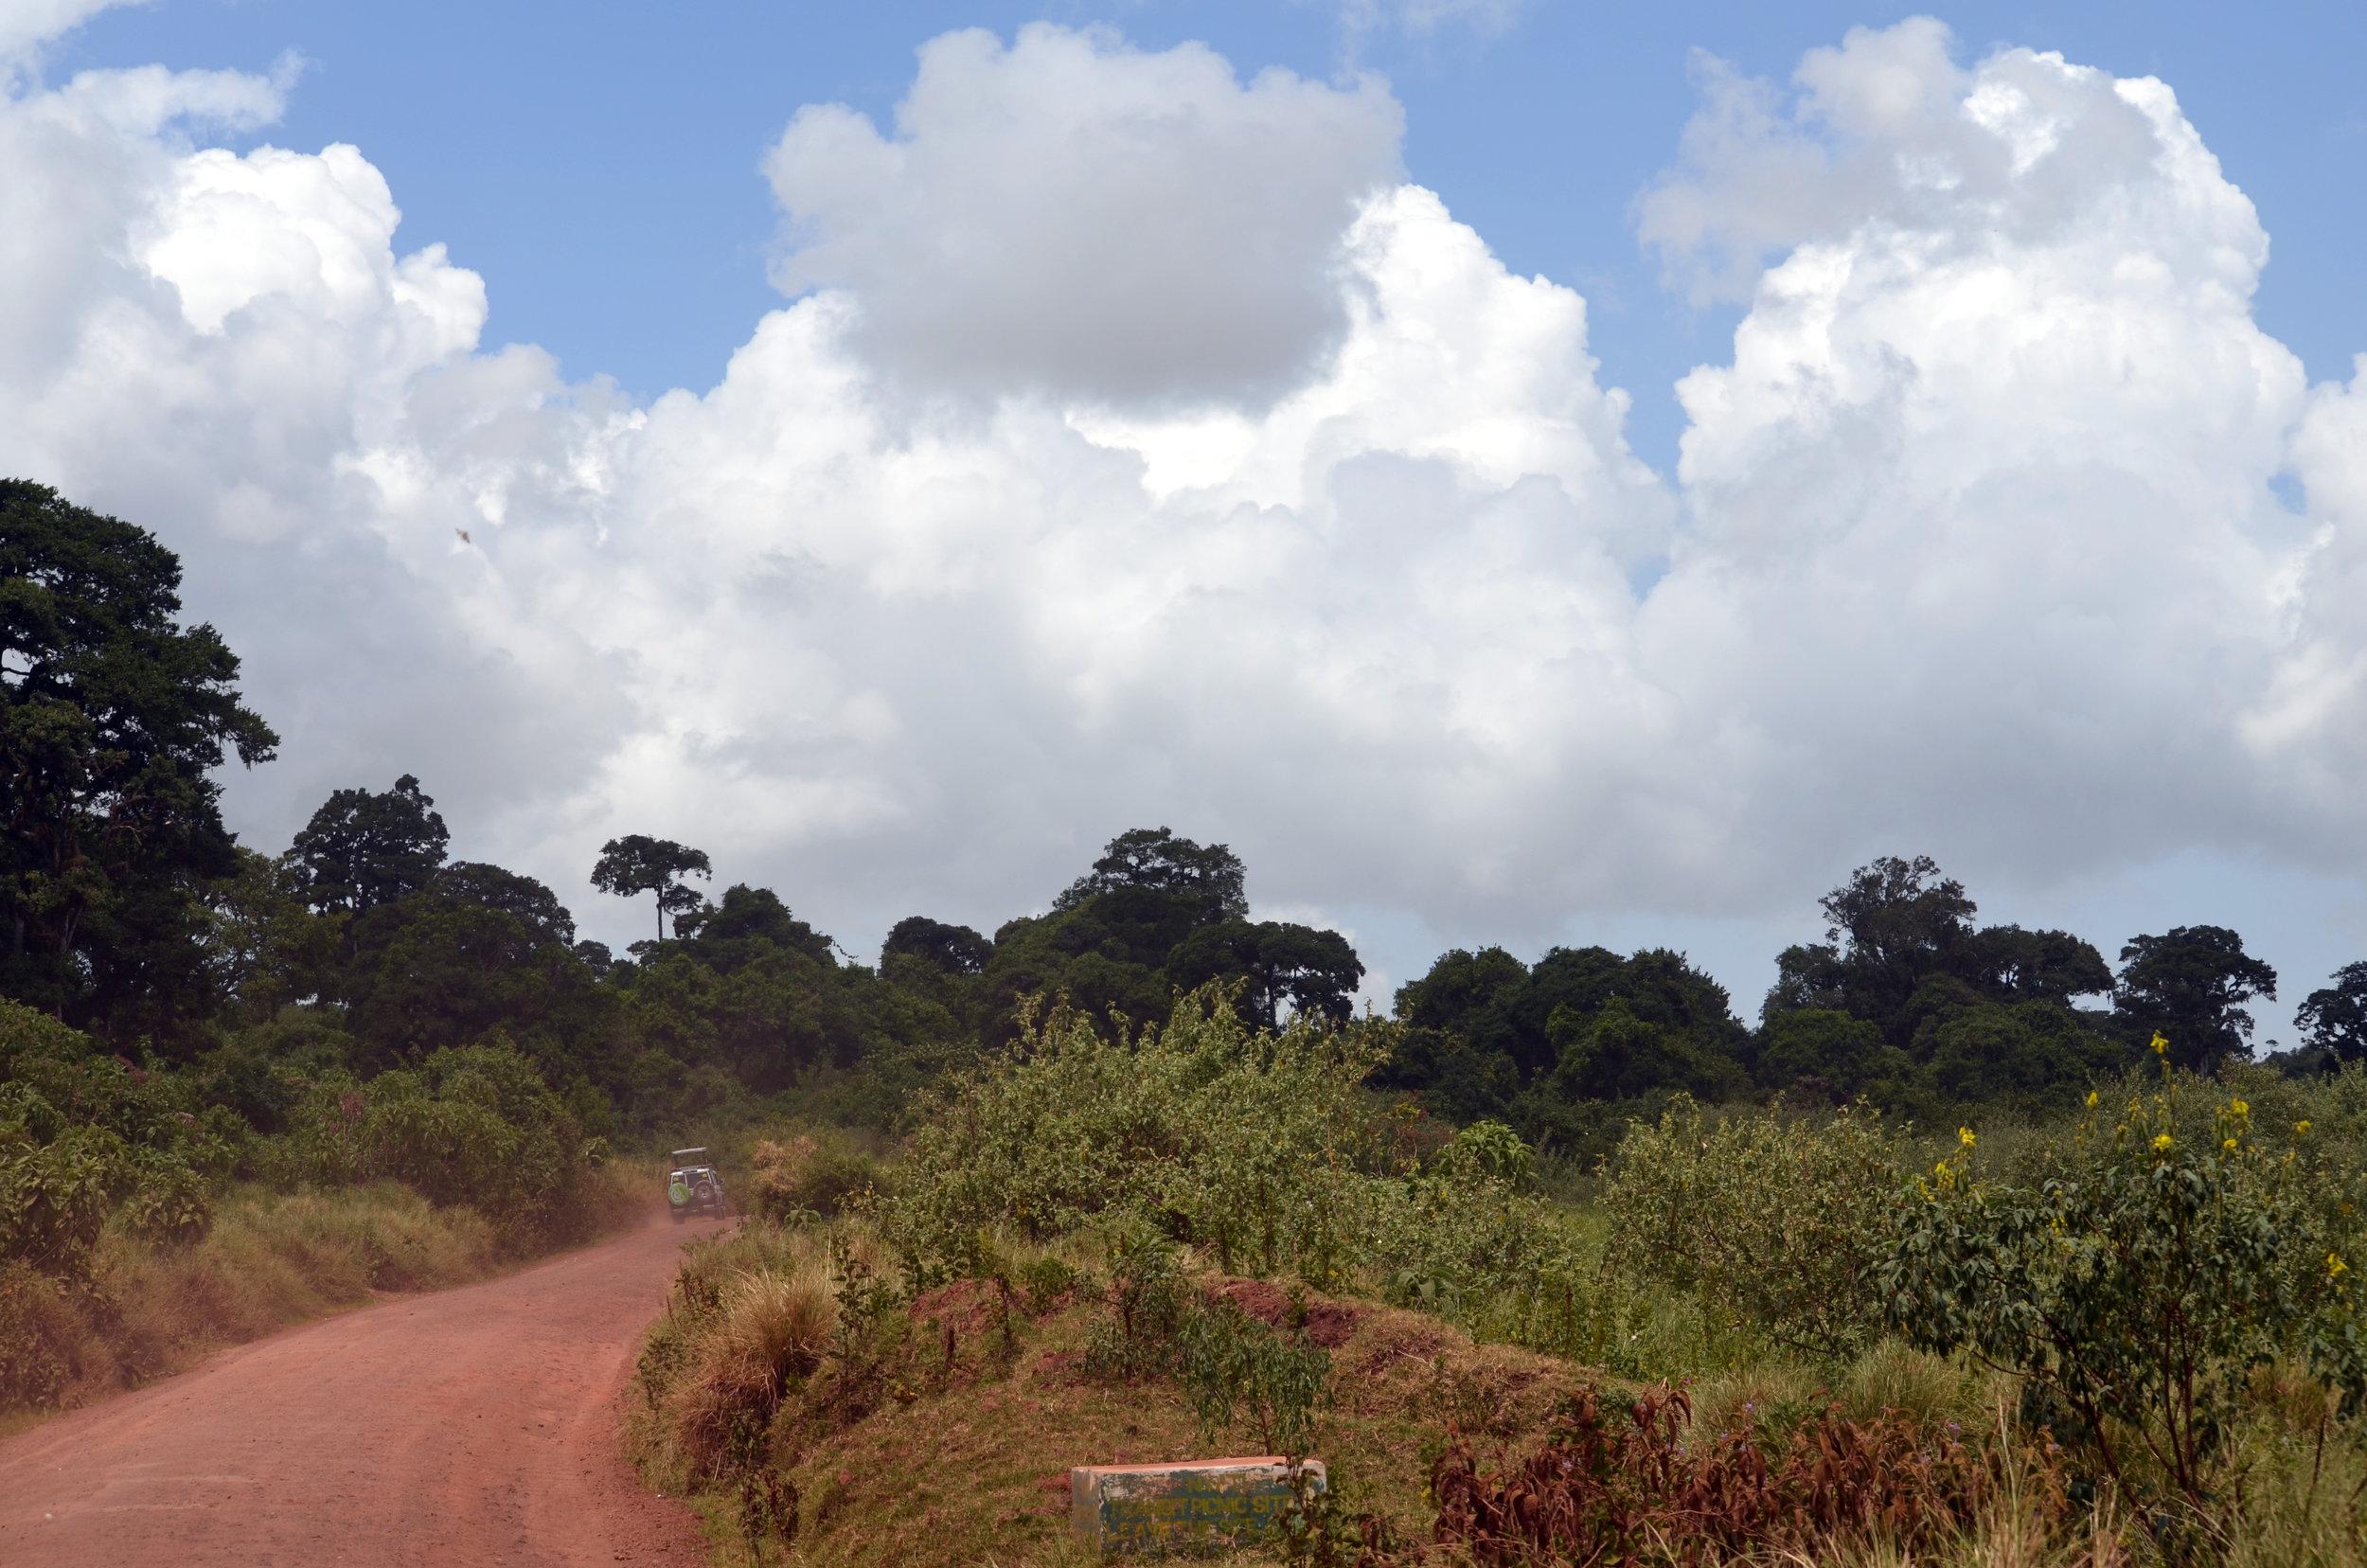 Copy of Rim of Ngorongoro Crater (AF030)